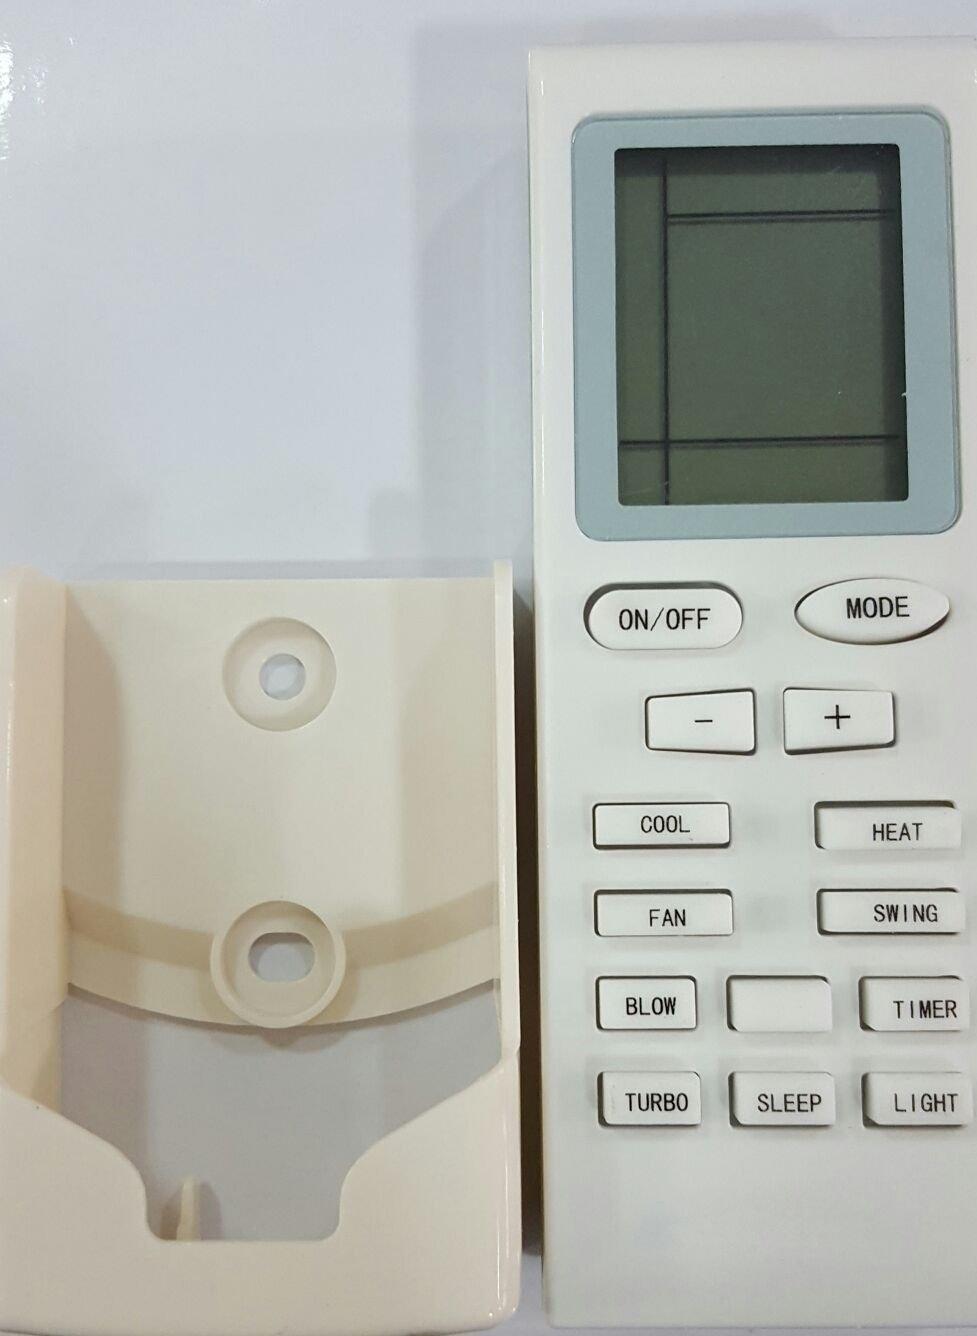 Cheap Tadiran Air Conditioner Find Tadiran Air Conditioner Deals On Line At Alibaba Com